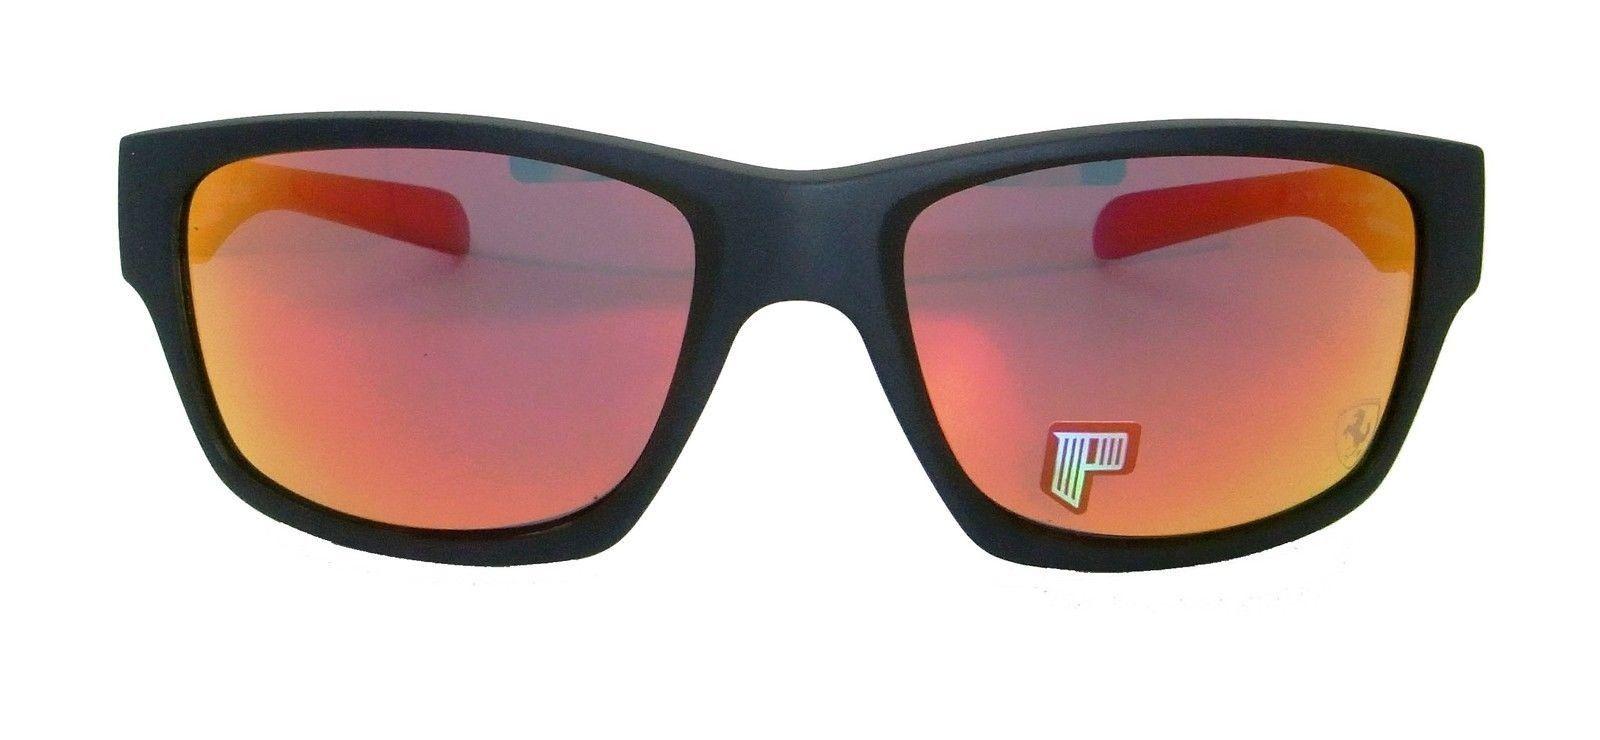 Oakley Jupiter Carbon Oo9220 Iridium Sport Sunglasses « Heritage Malta 4bcedf4d7a